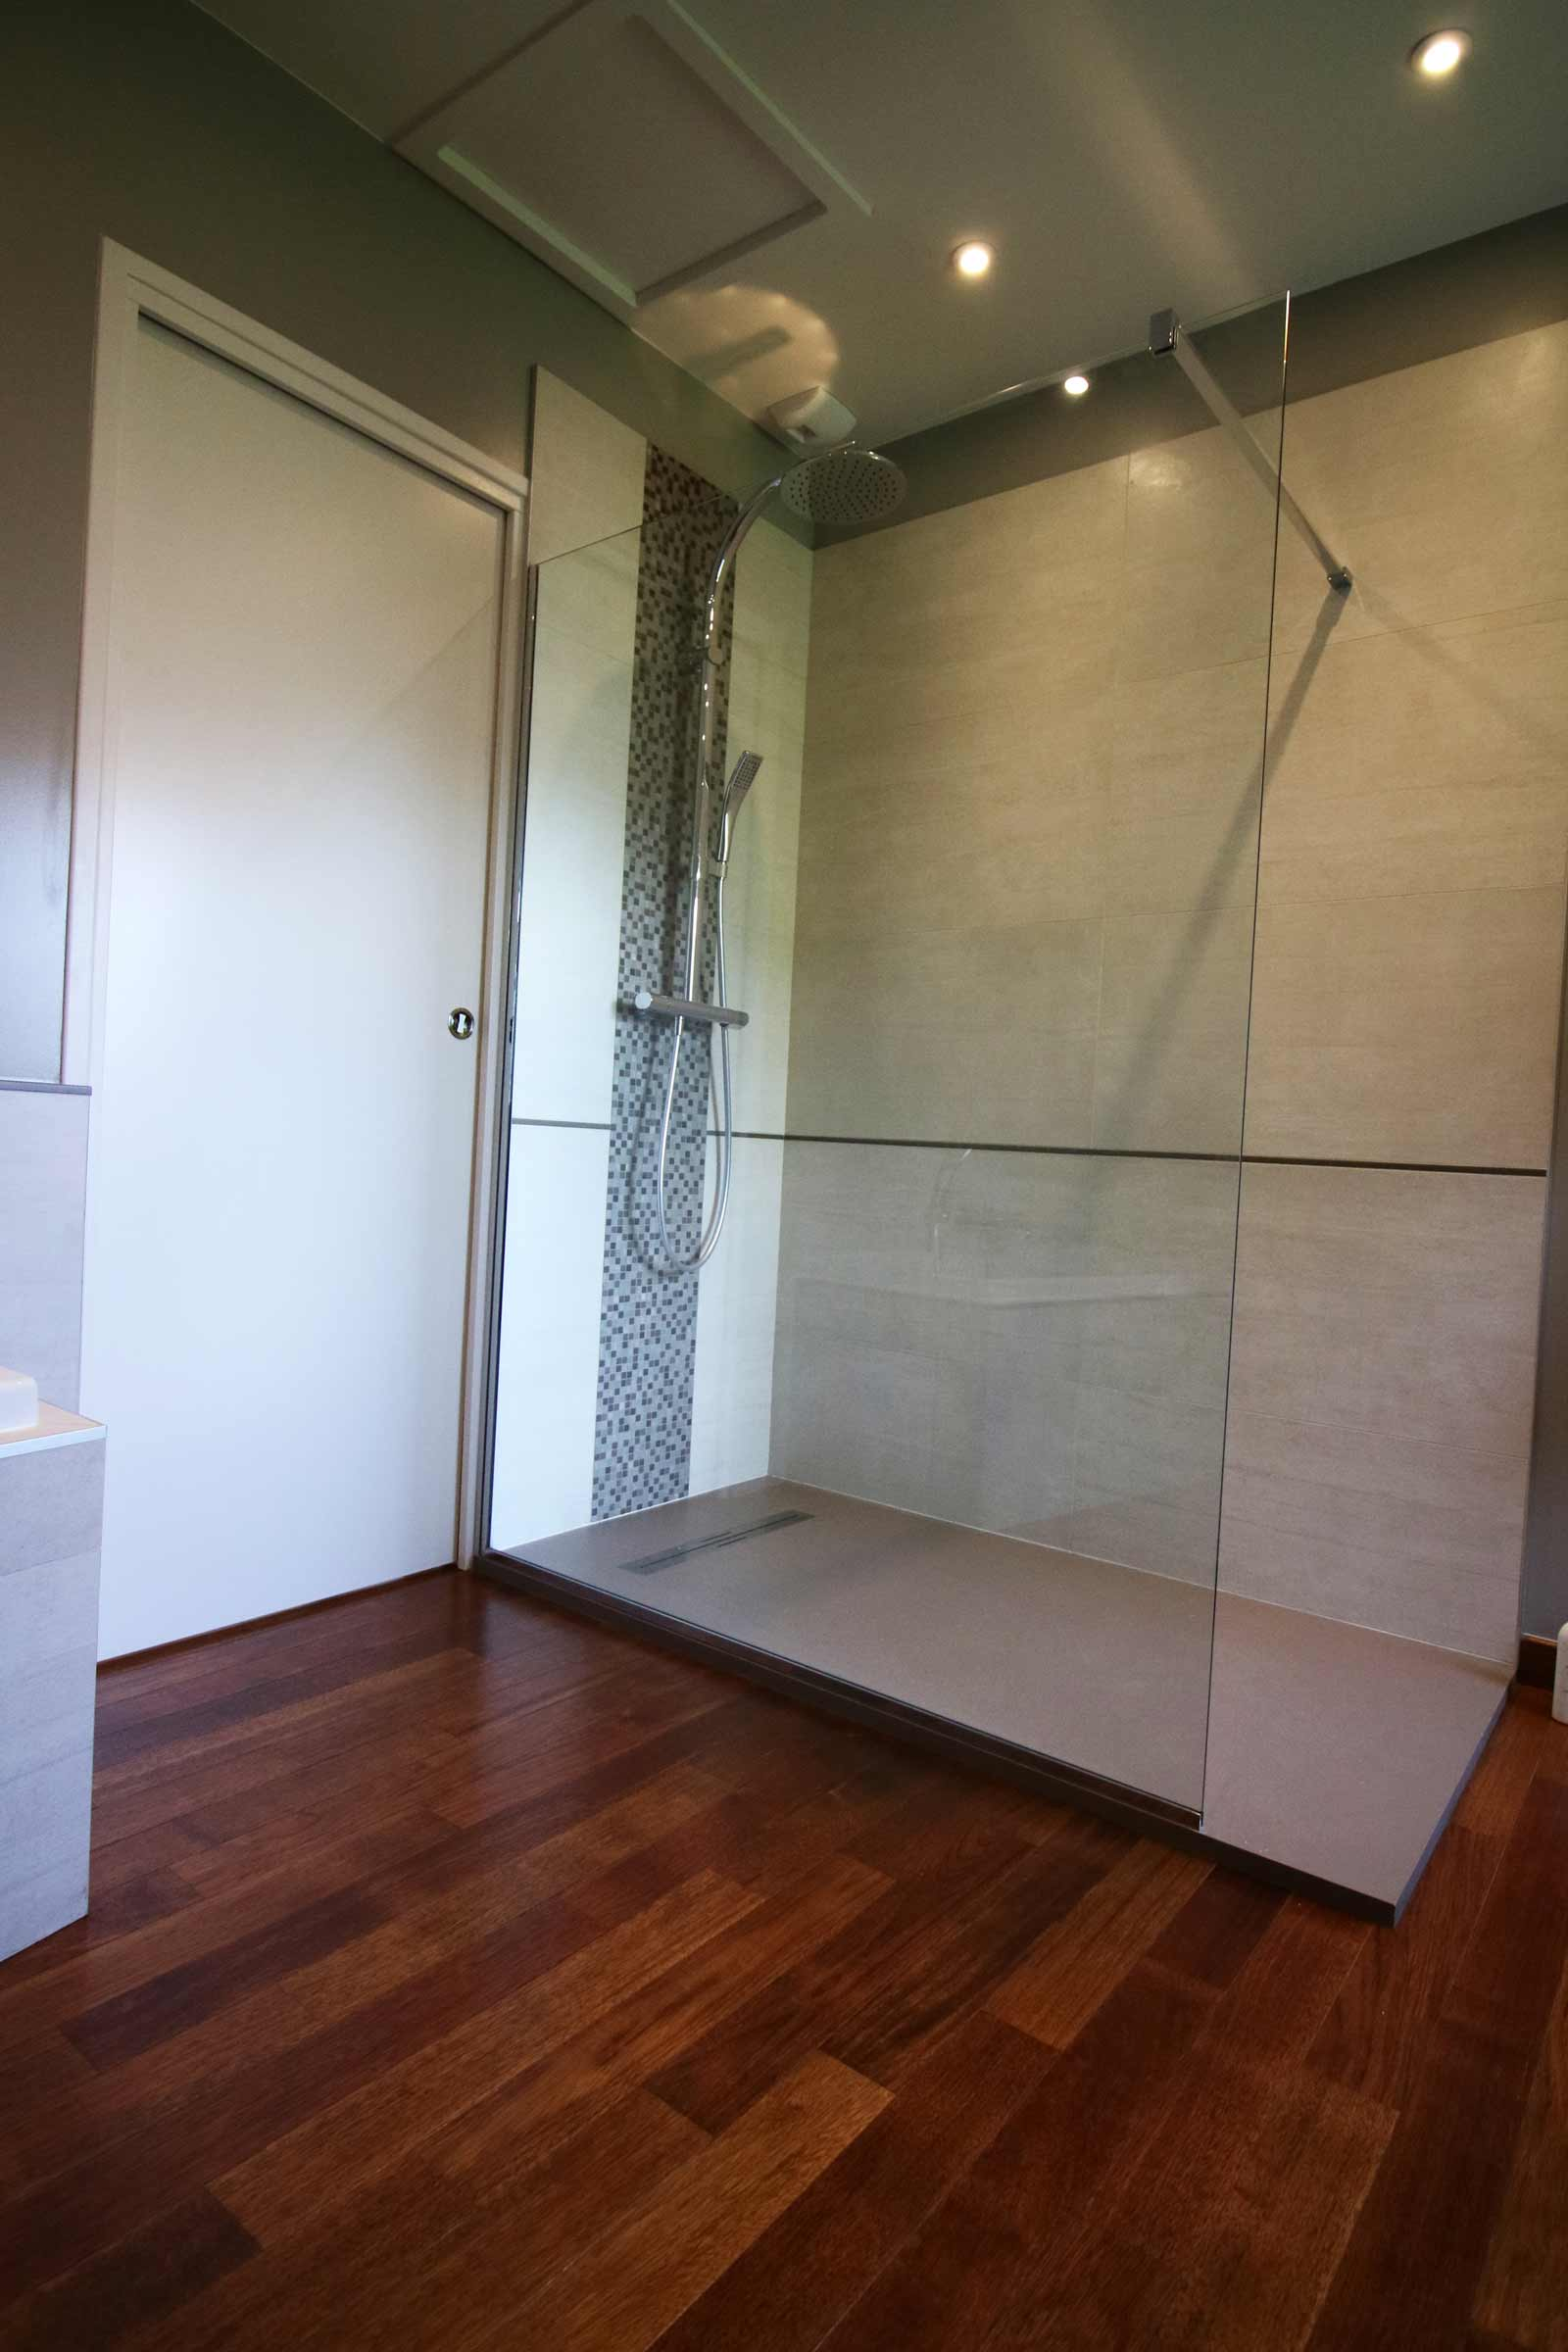 salle-de-bain-grenoble-merbau-grande-douche-paroi-de-douche-colonne ...